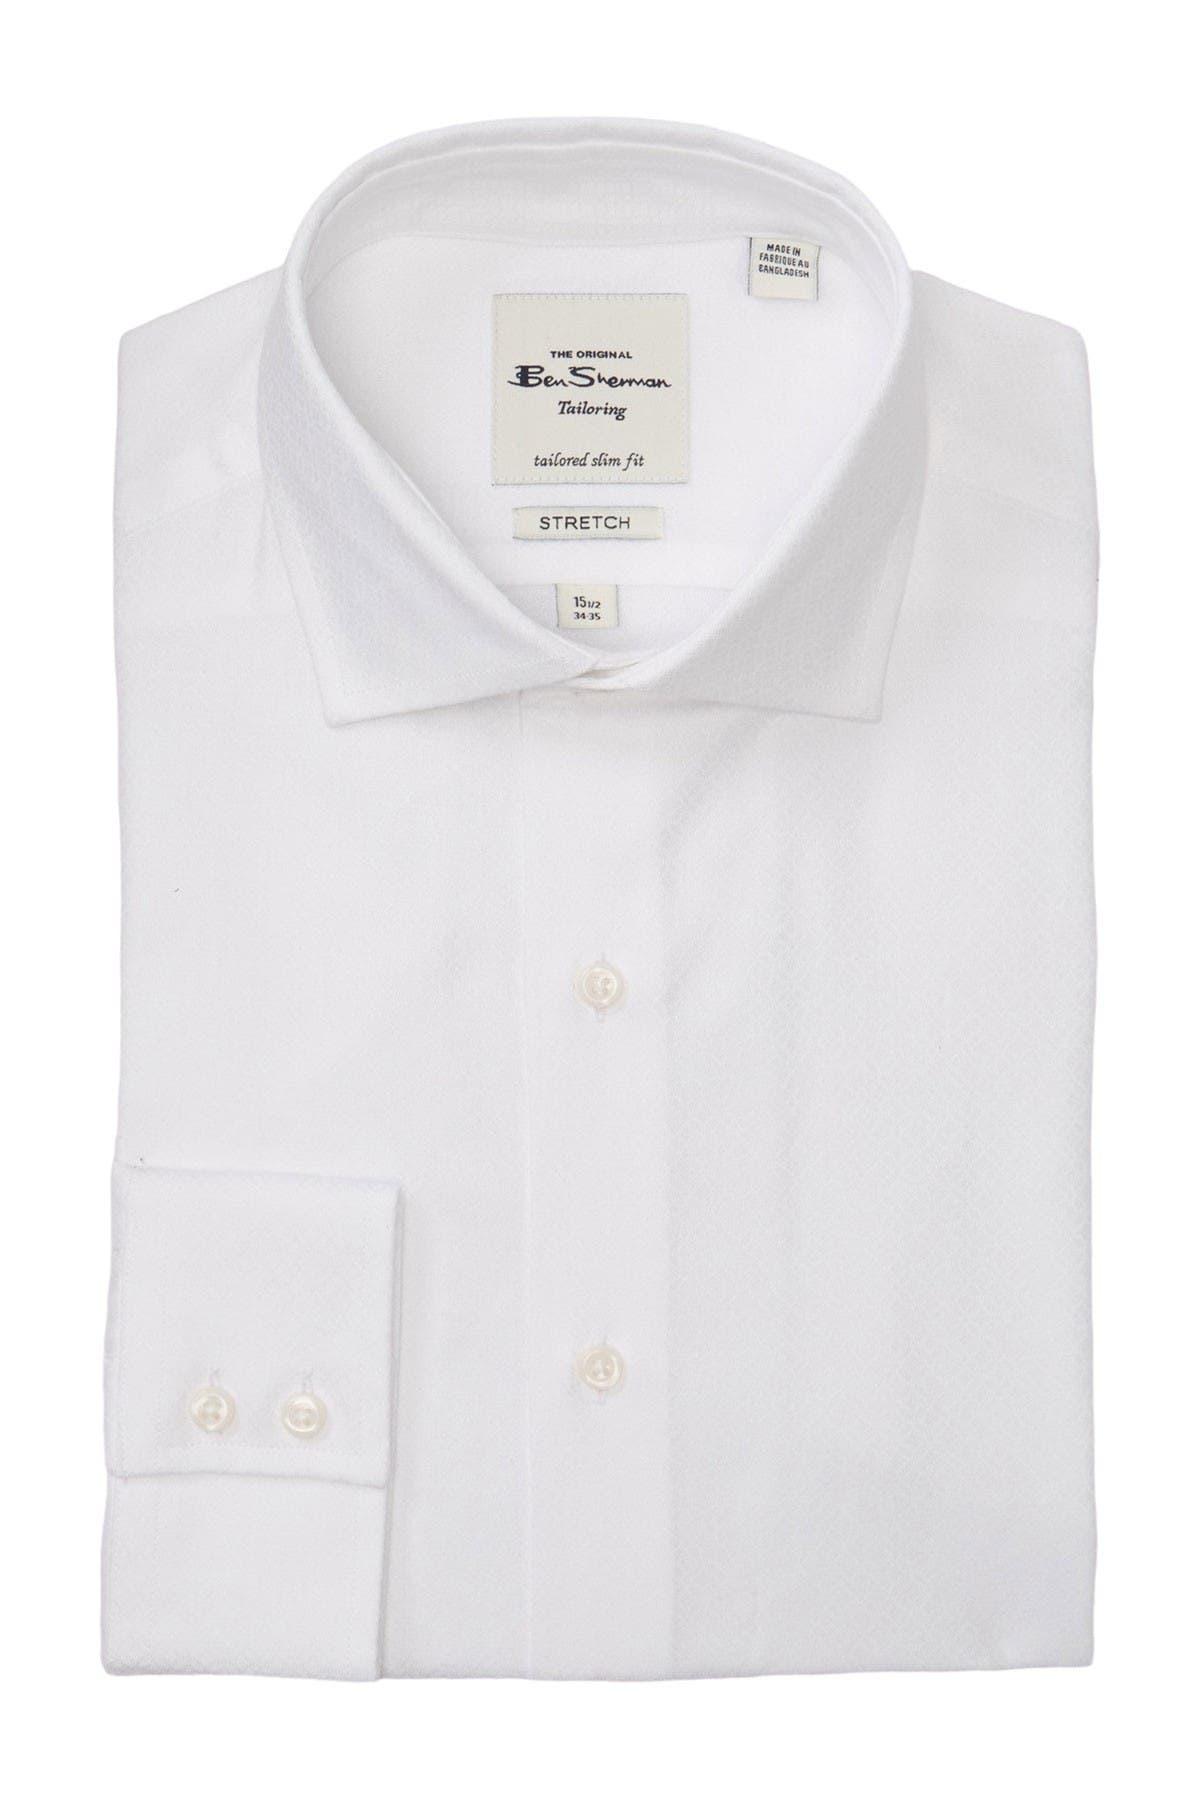 Image of Ben Sherman White On White Floral Geo Print Dobby Slim Fit Shirt